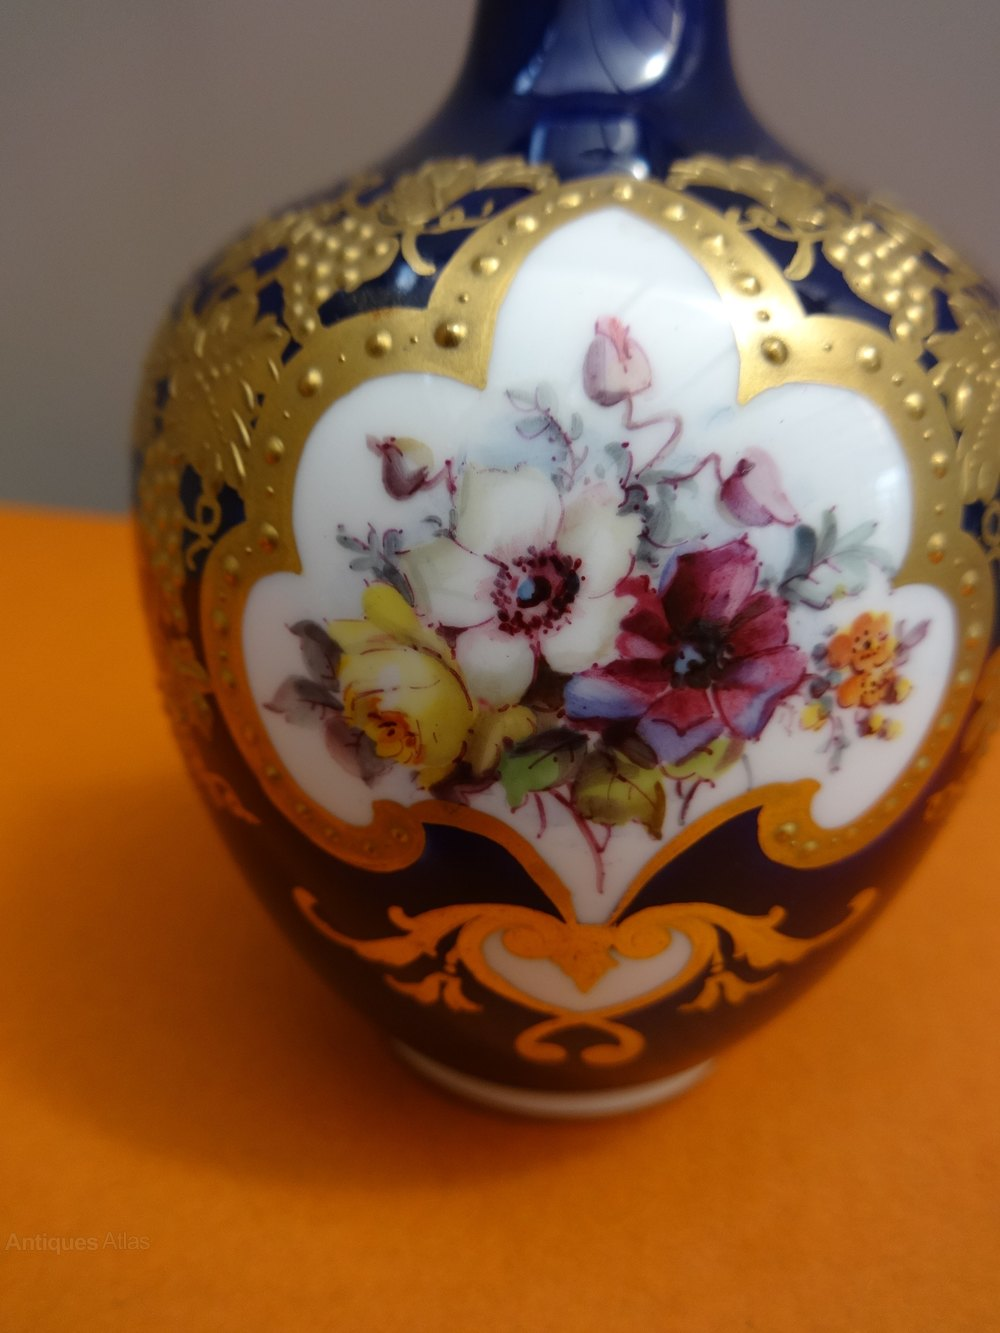 Antiques atlas miniature handpainted royal crown derby vase miniature handpainted royal crown derby vase ceramics royal crown derby reviewsmspy